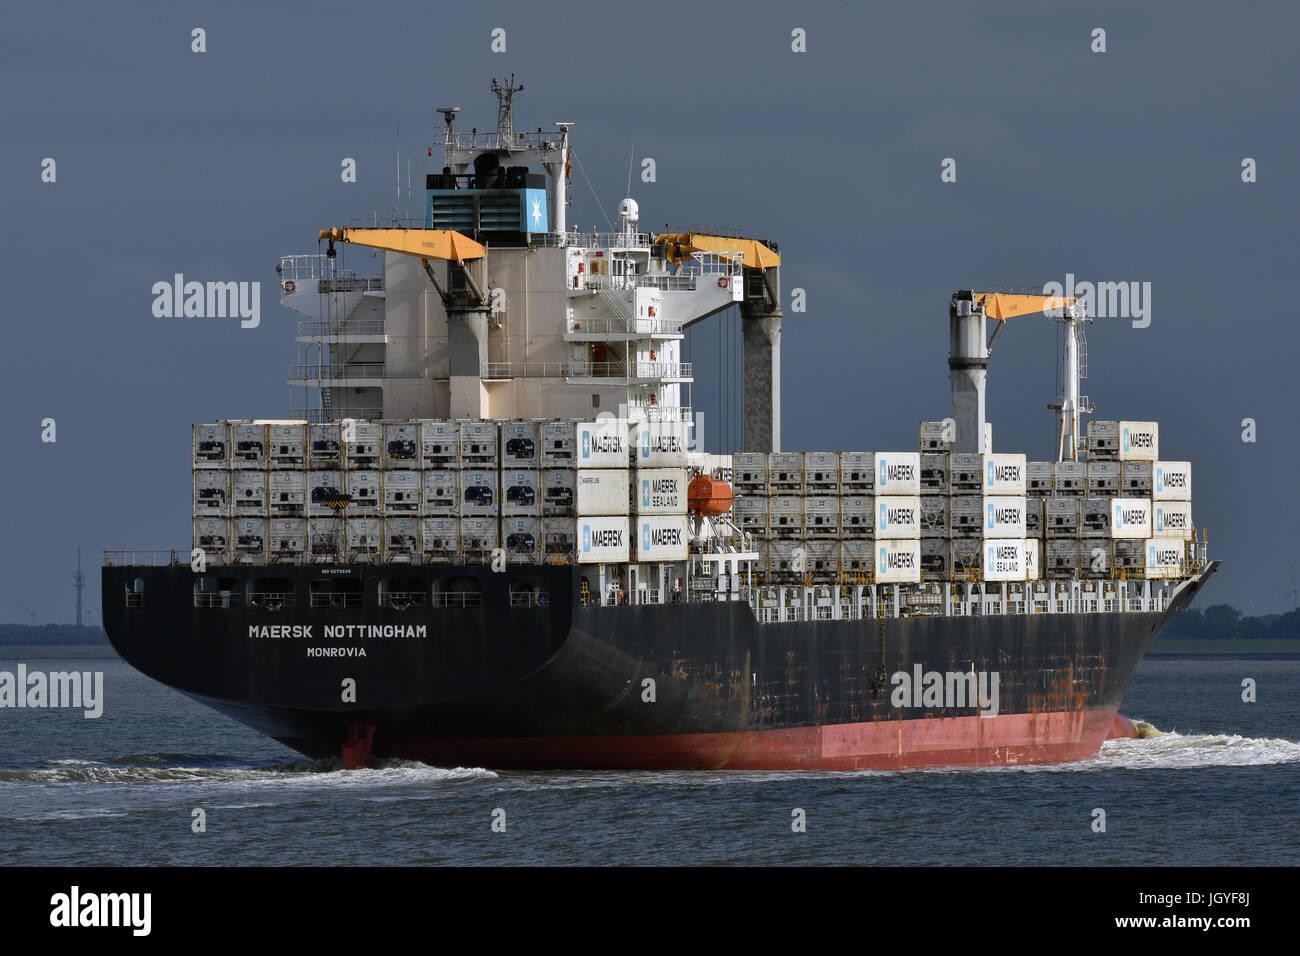 Maersk Nottingham Stock Photo